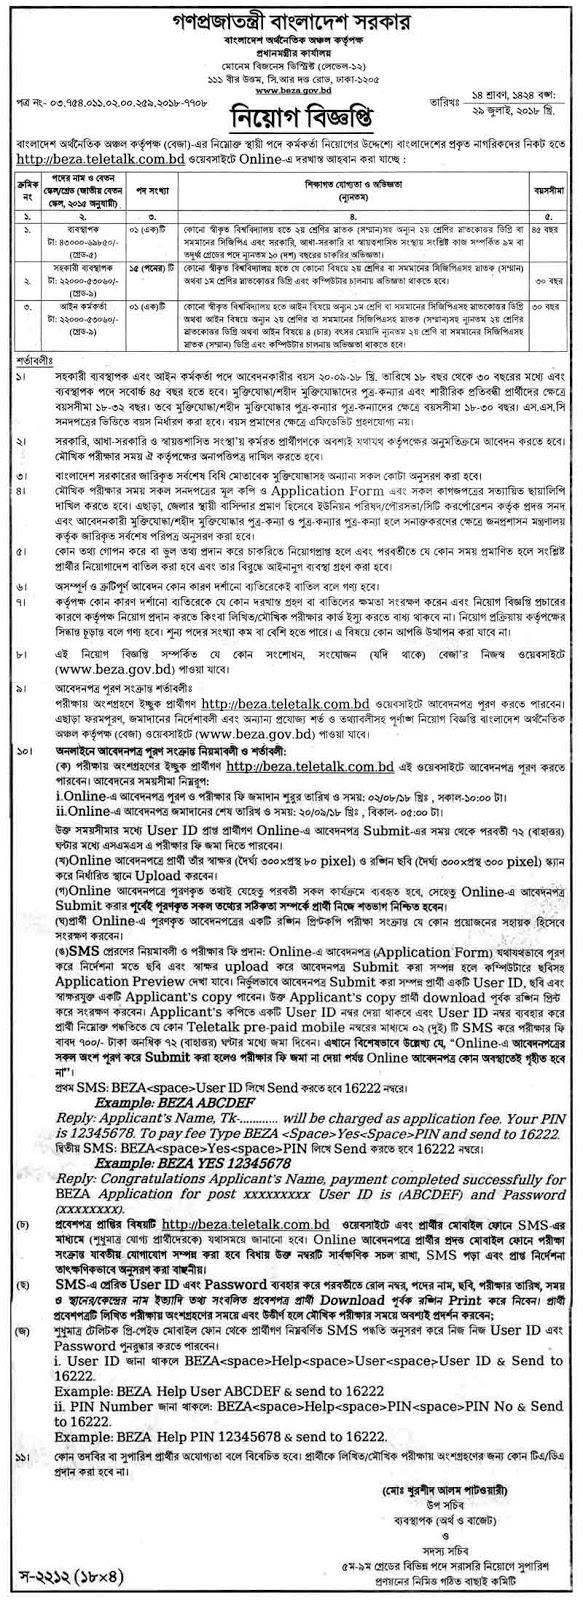 Bangladesh Economic Zone Authority-BEZA Job Circular 2018